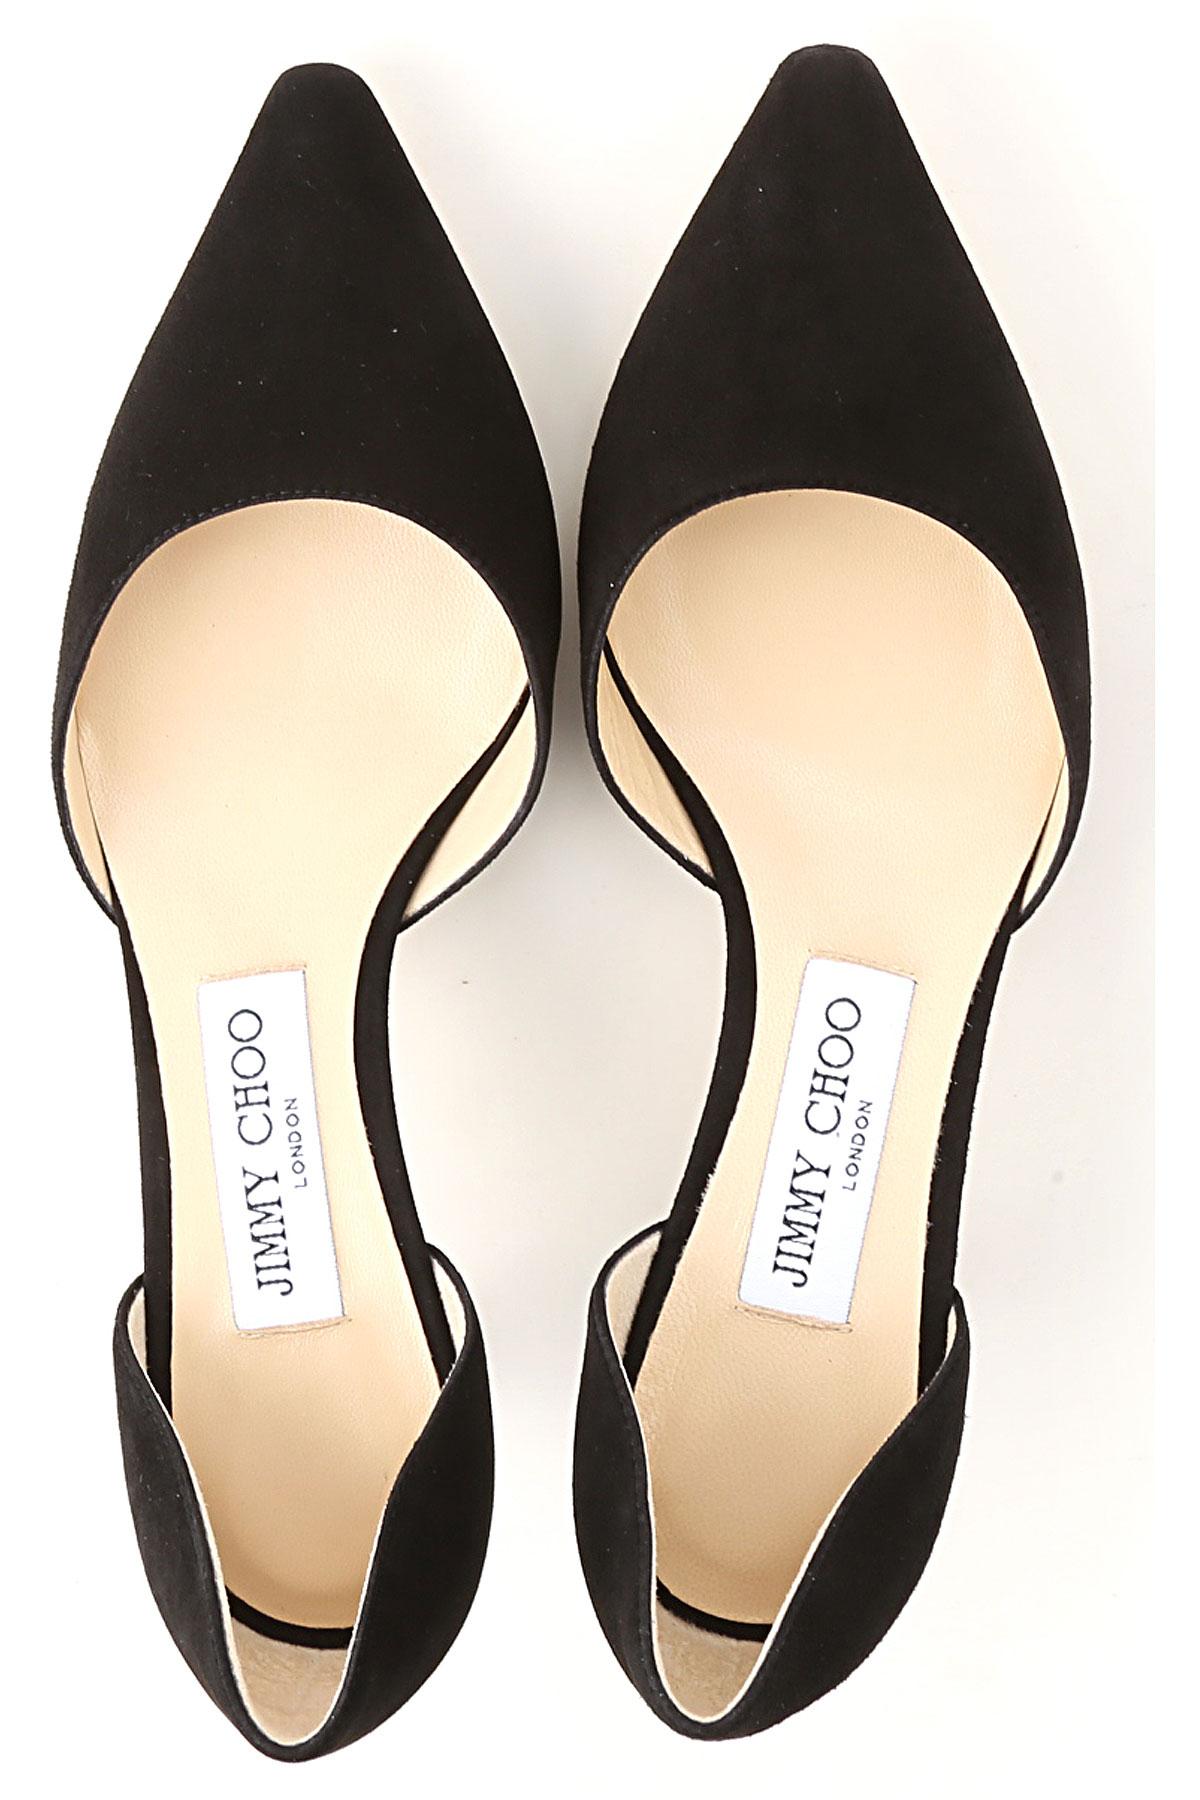 verano Jimmy Choo Negro Primavera Mujer Zapatos 2019 Para nbsp; wzXOzPxq